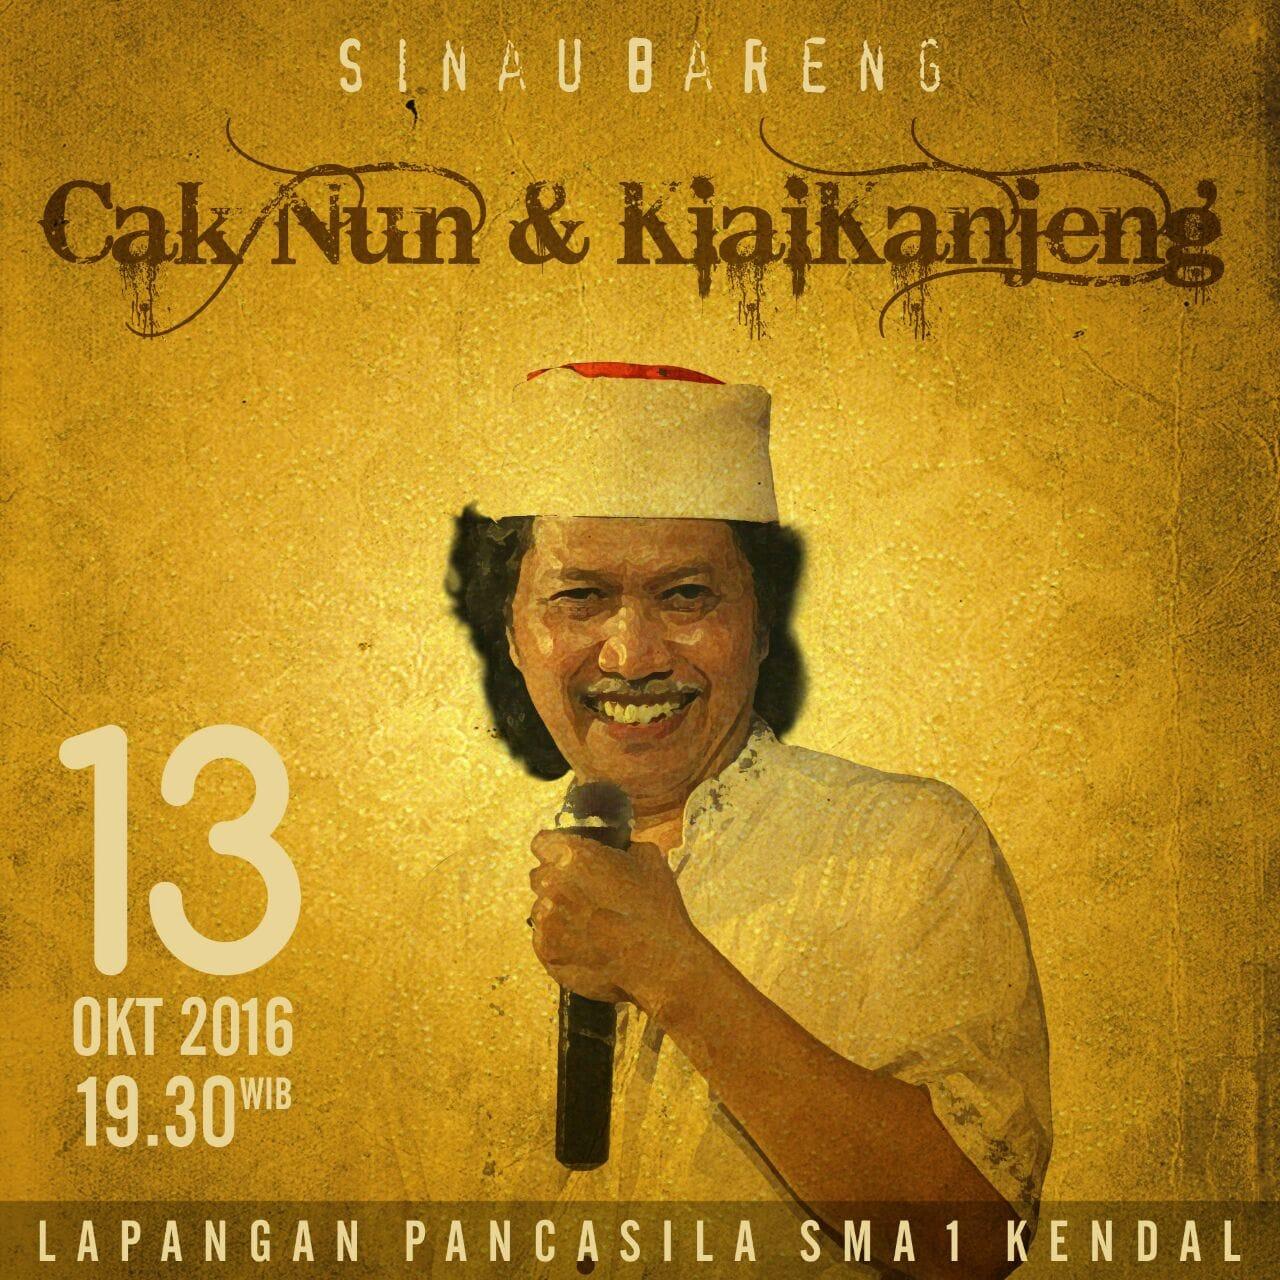 55 Tahun SMANlK Bersama Cak Nun dan KiaiKanjeng